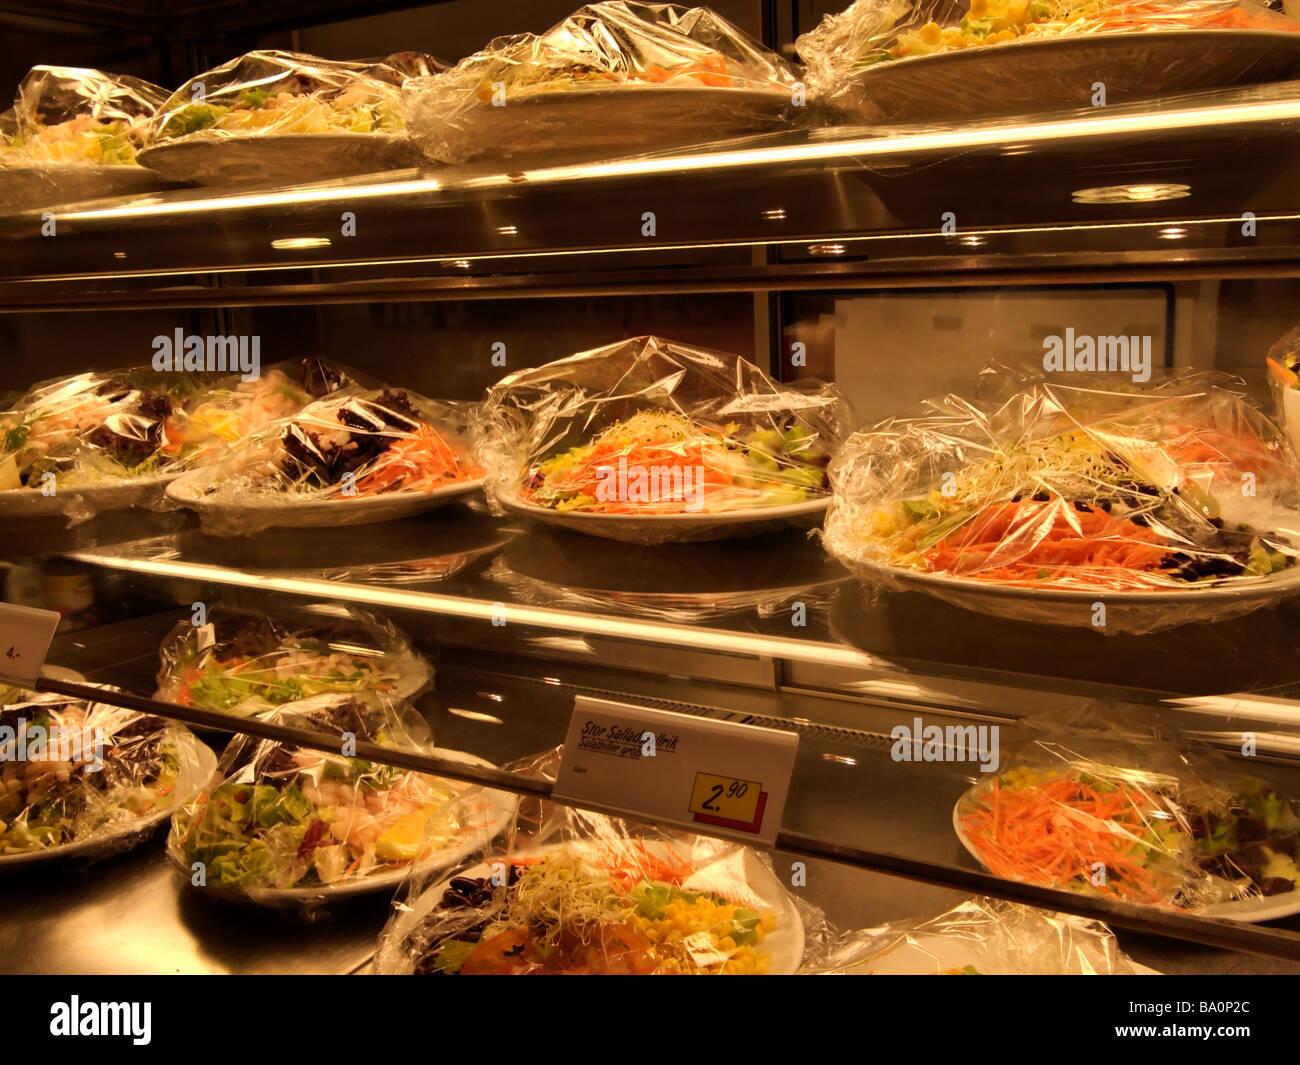 Self service salad food bar in a cafe restaurant stock for Food bar 36 cafe